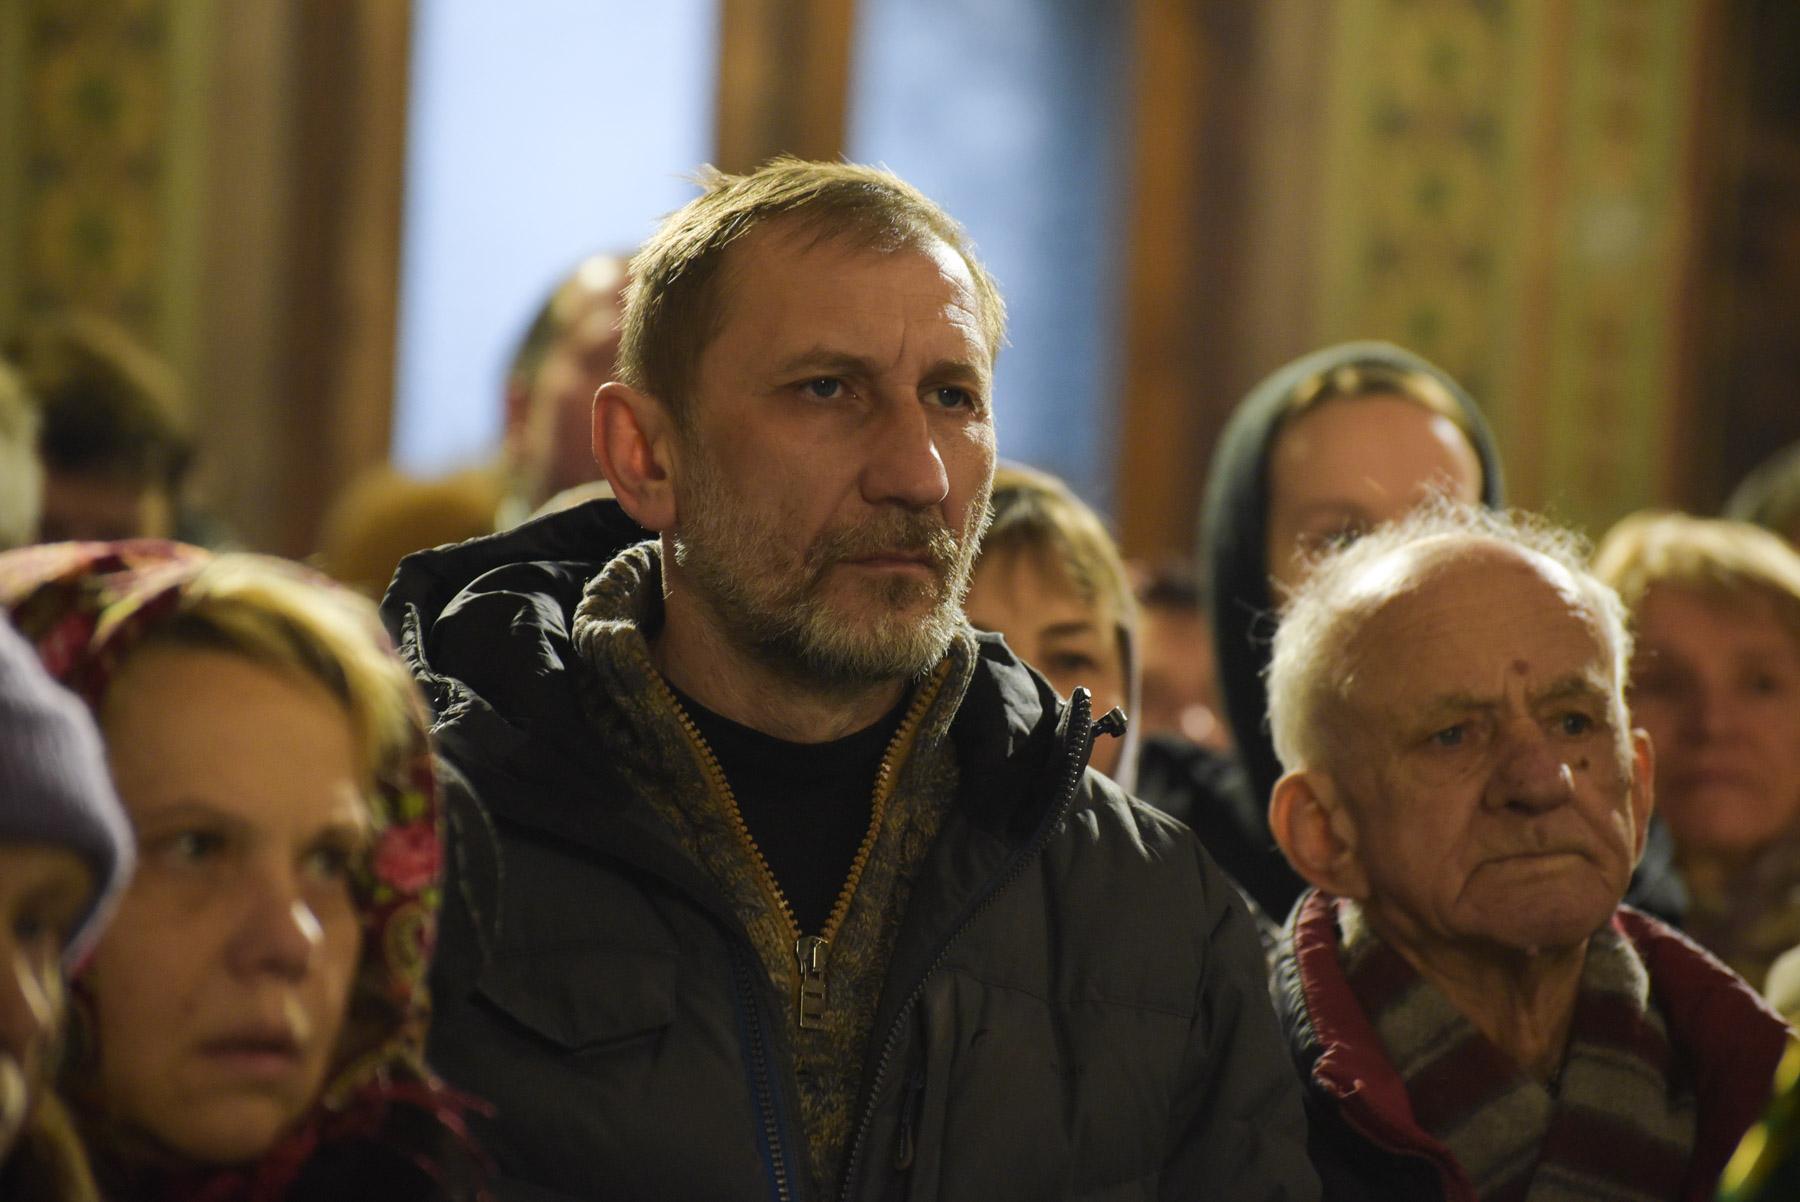 photos of orthodox christmas 0045 2